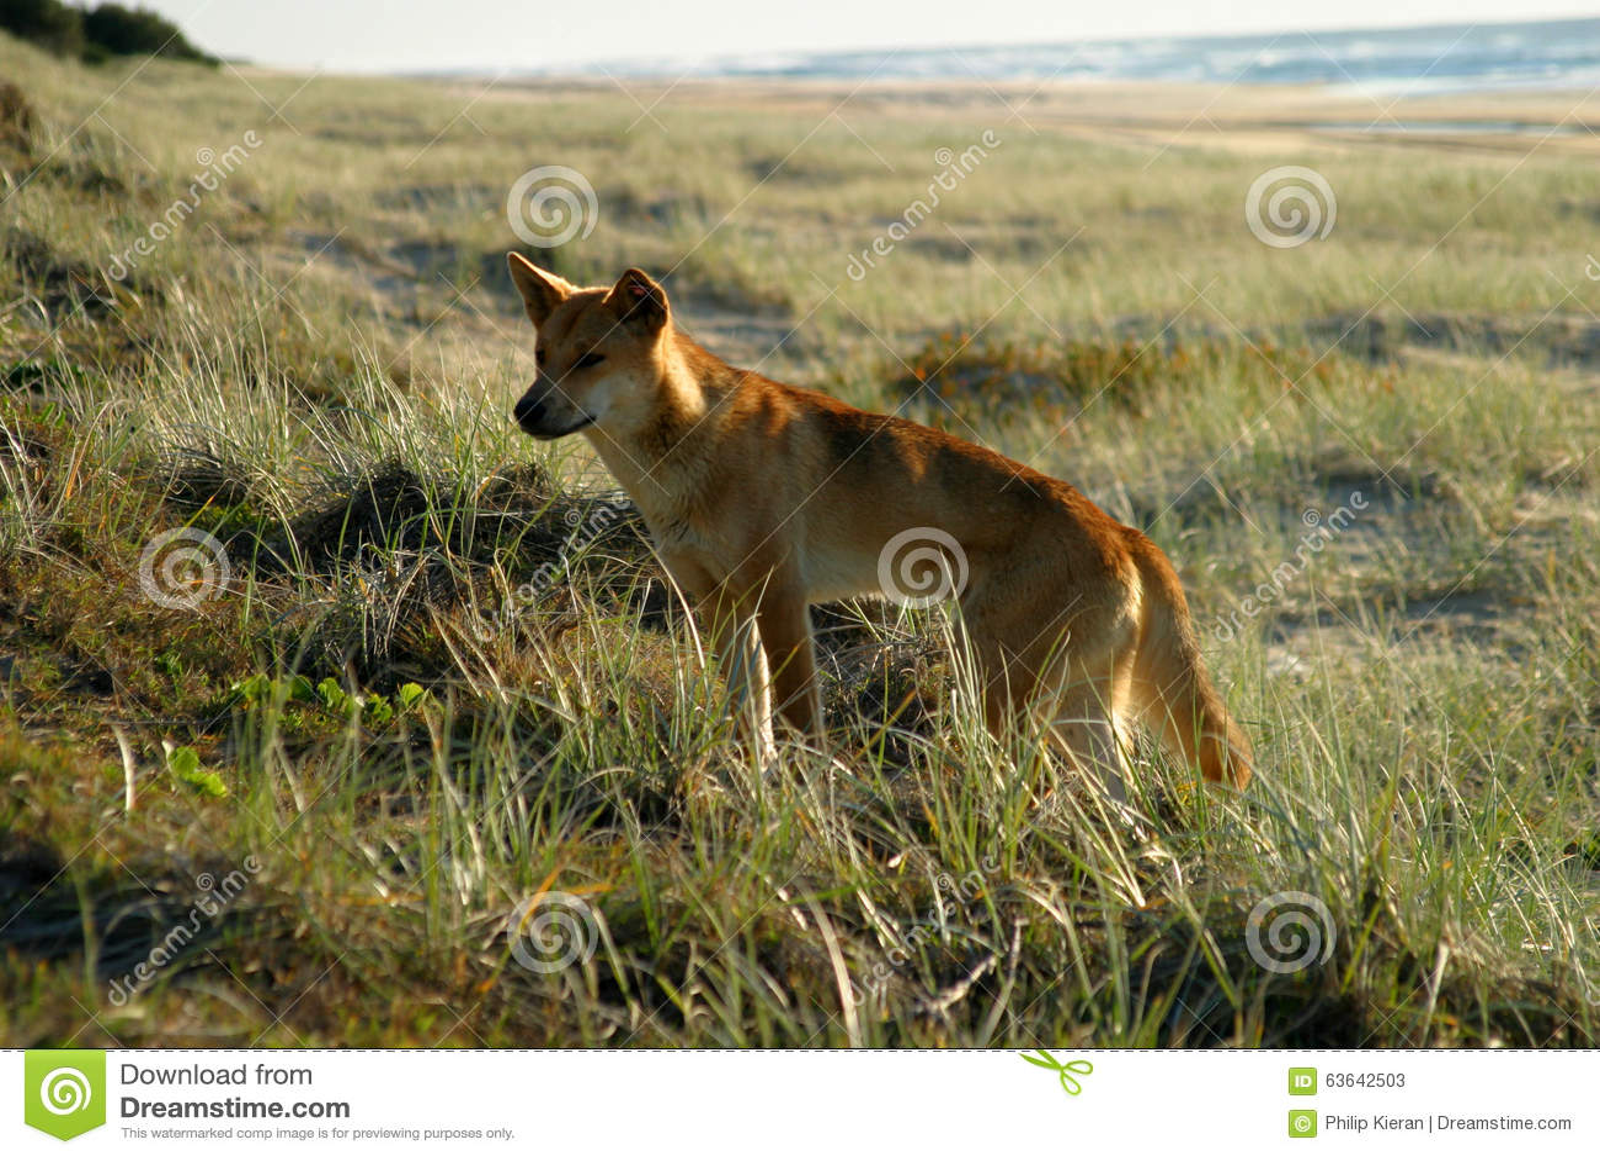 Fraser Island Australia Dingo Stock Image - Image of road, wildlife